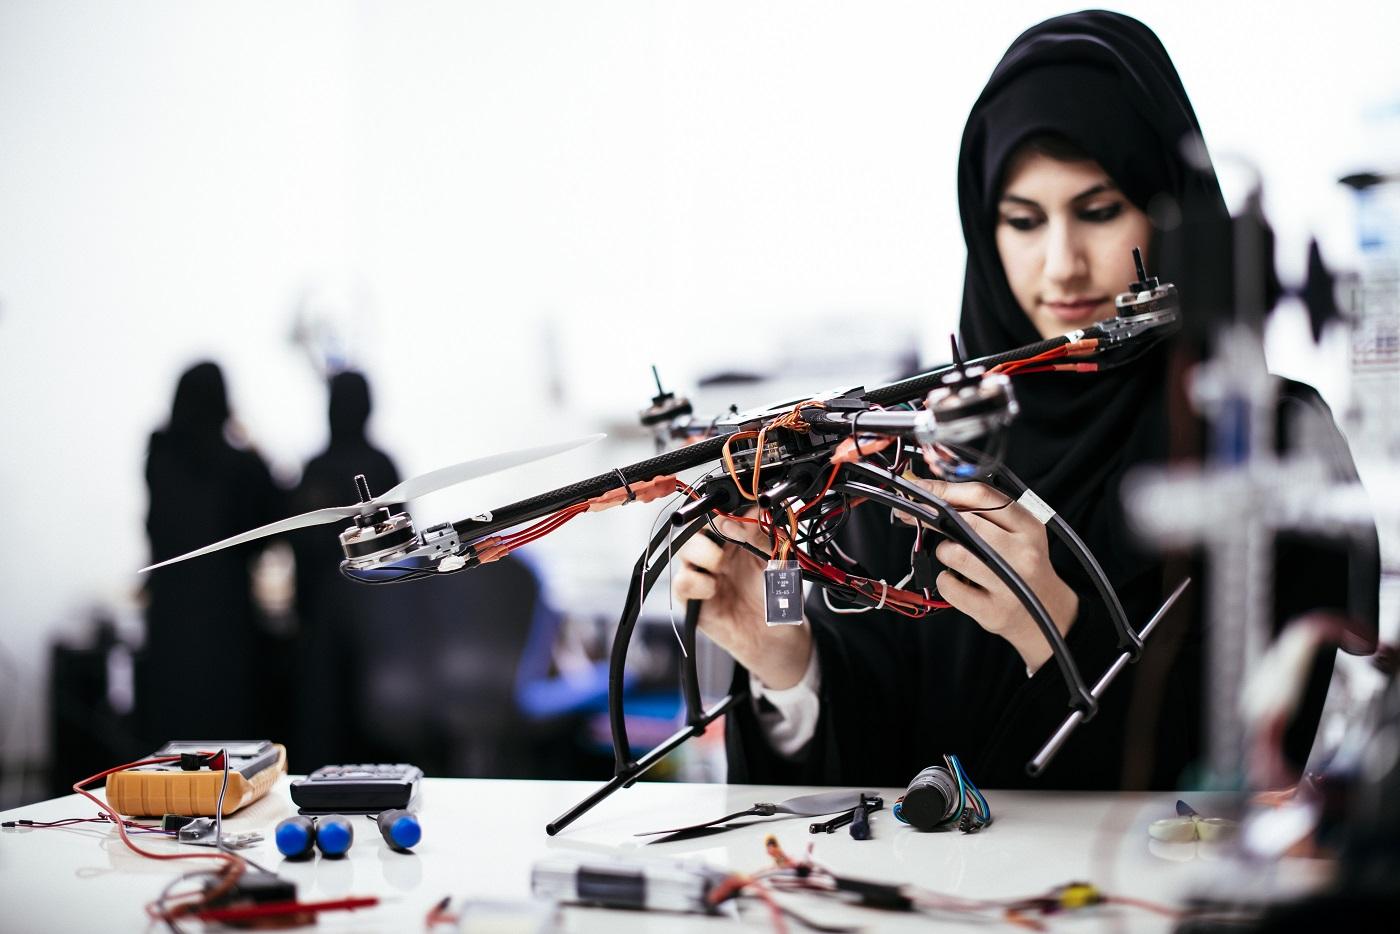 Robotics and Intelligent Systems Institute